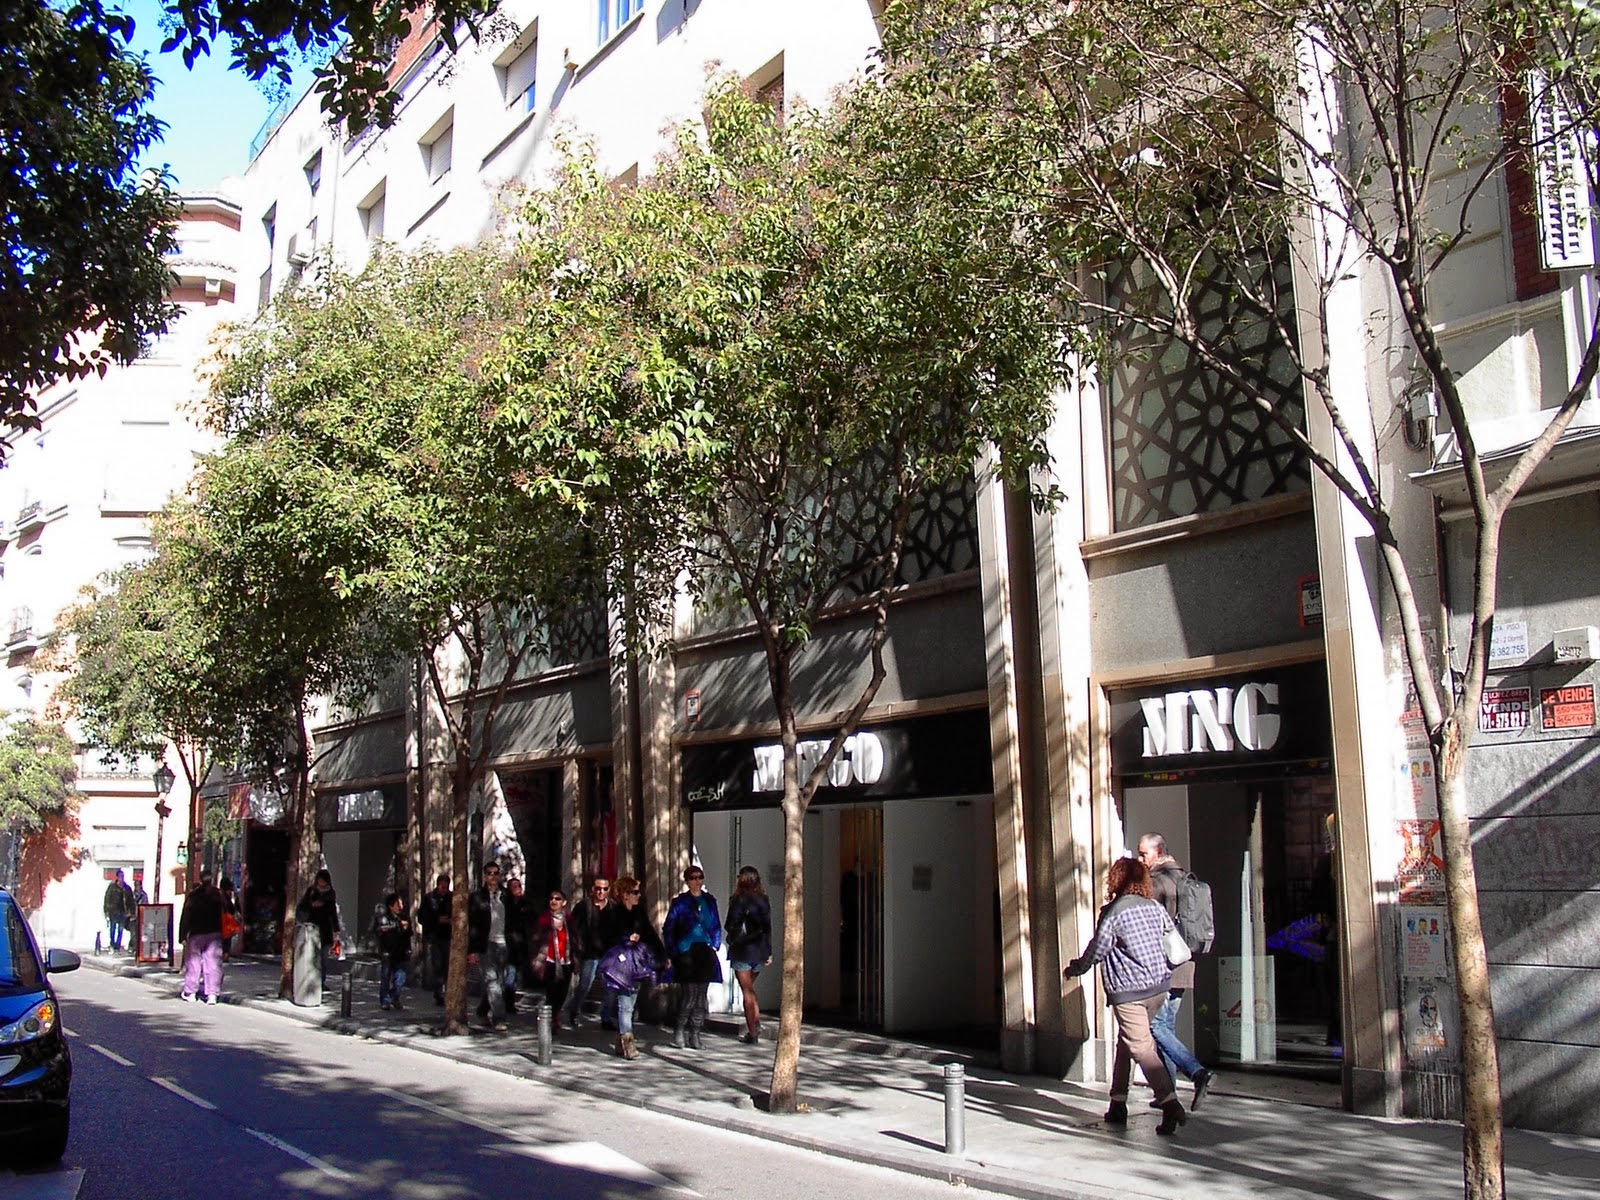 Calle-de-Fuencarral-Madrid-Espanha